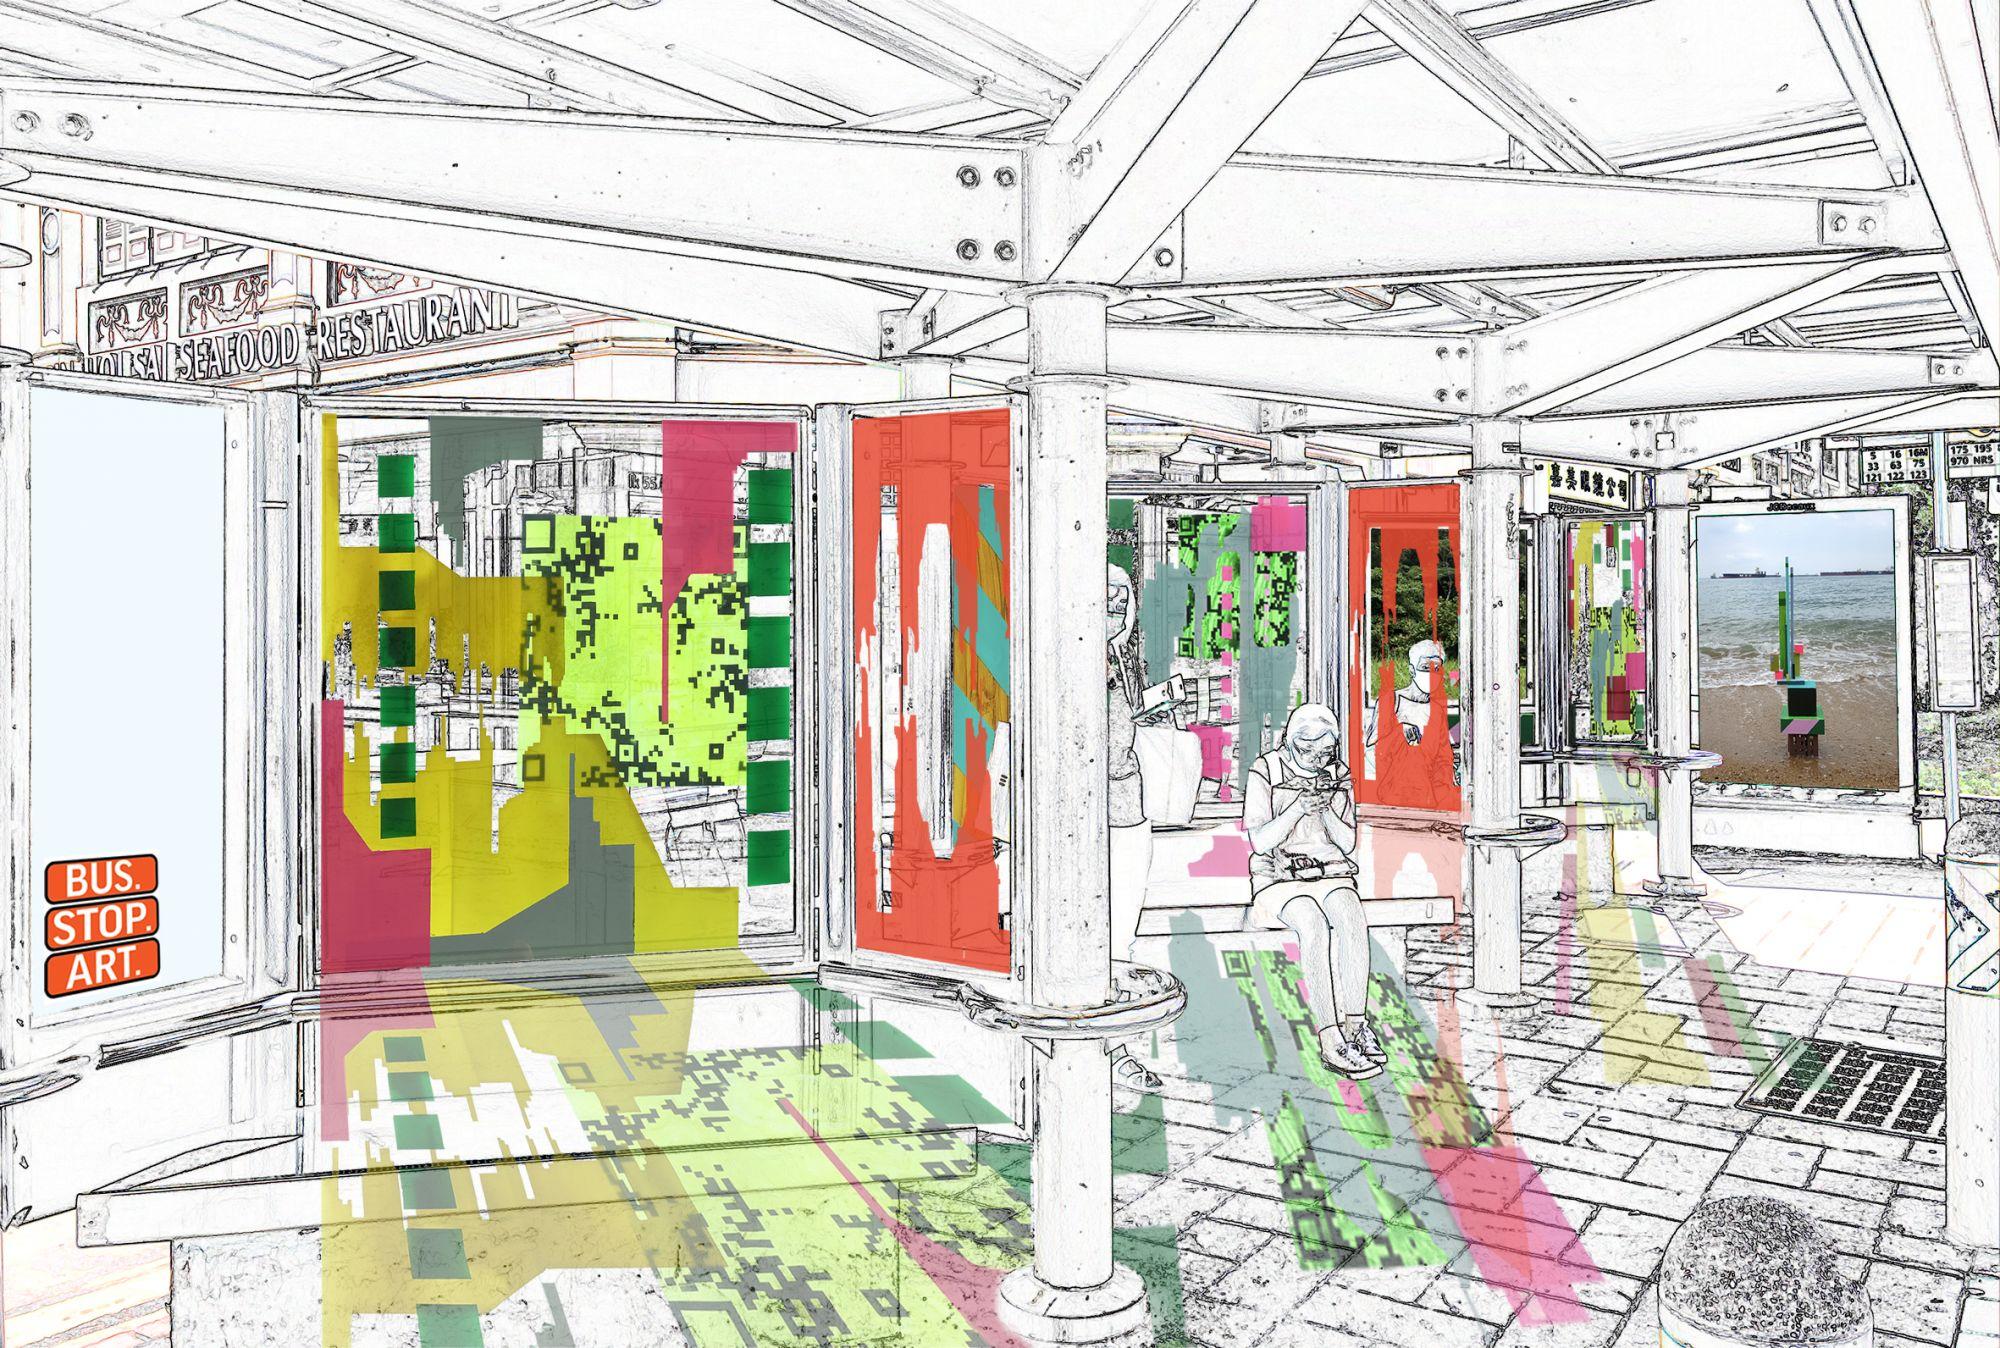 Singapore Art Week 2021: Curator Amelia Abdullahsani on the Exhibition, Bus.Stop.Art.